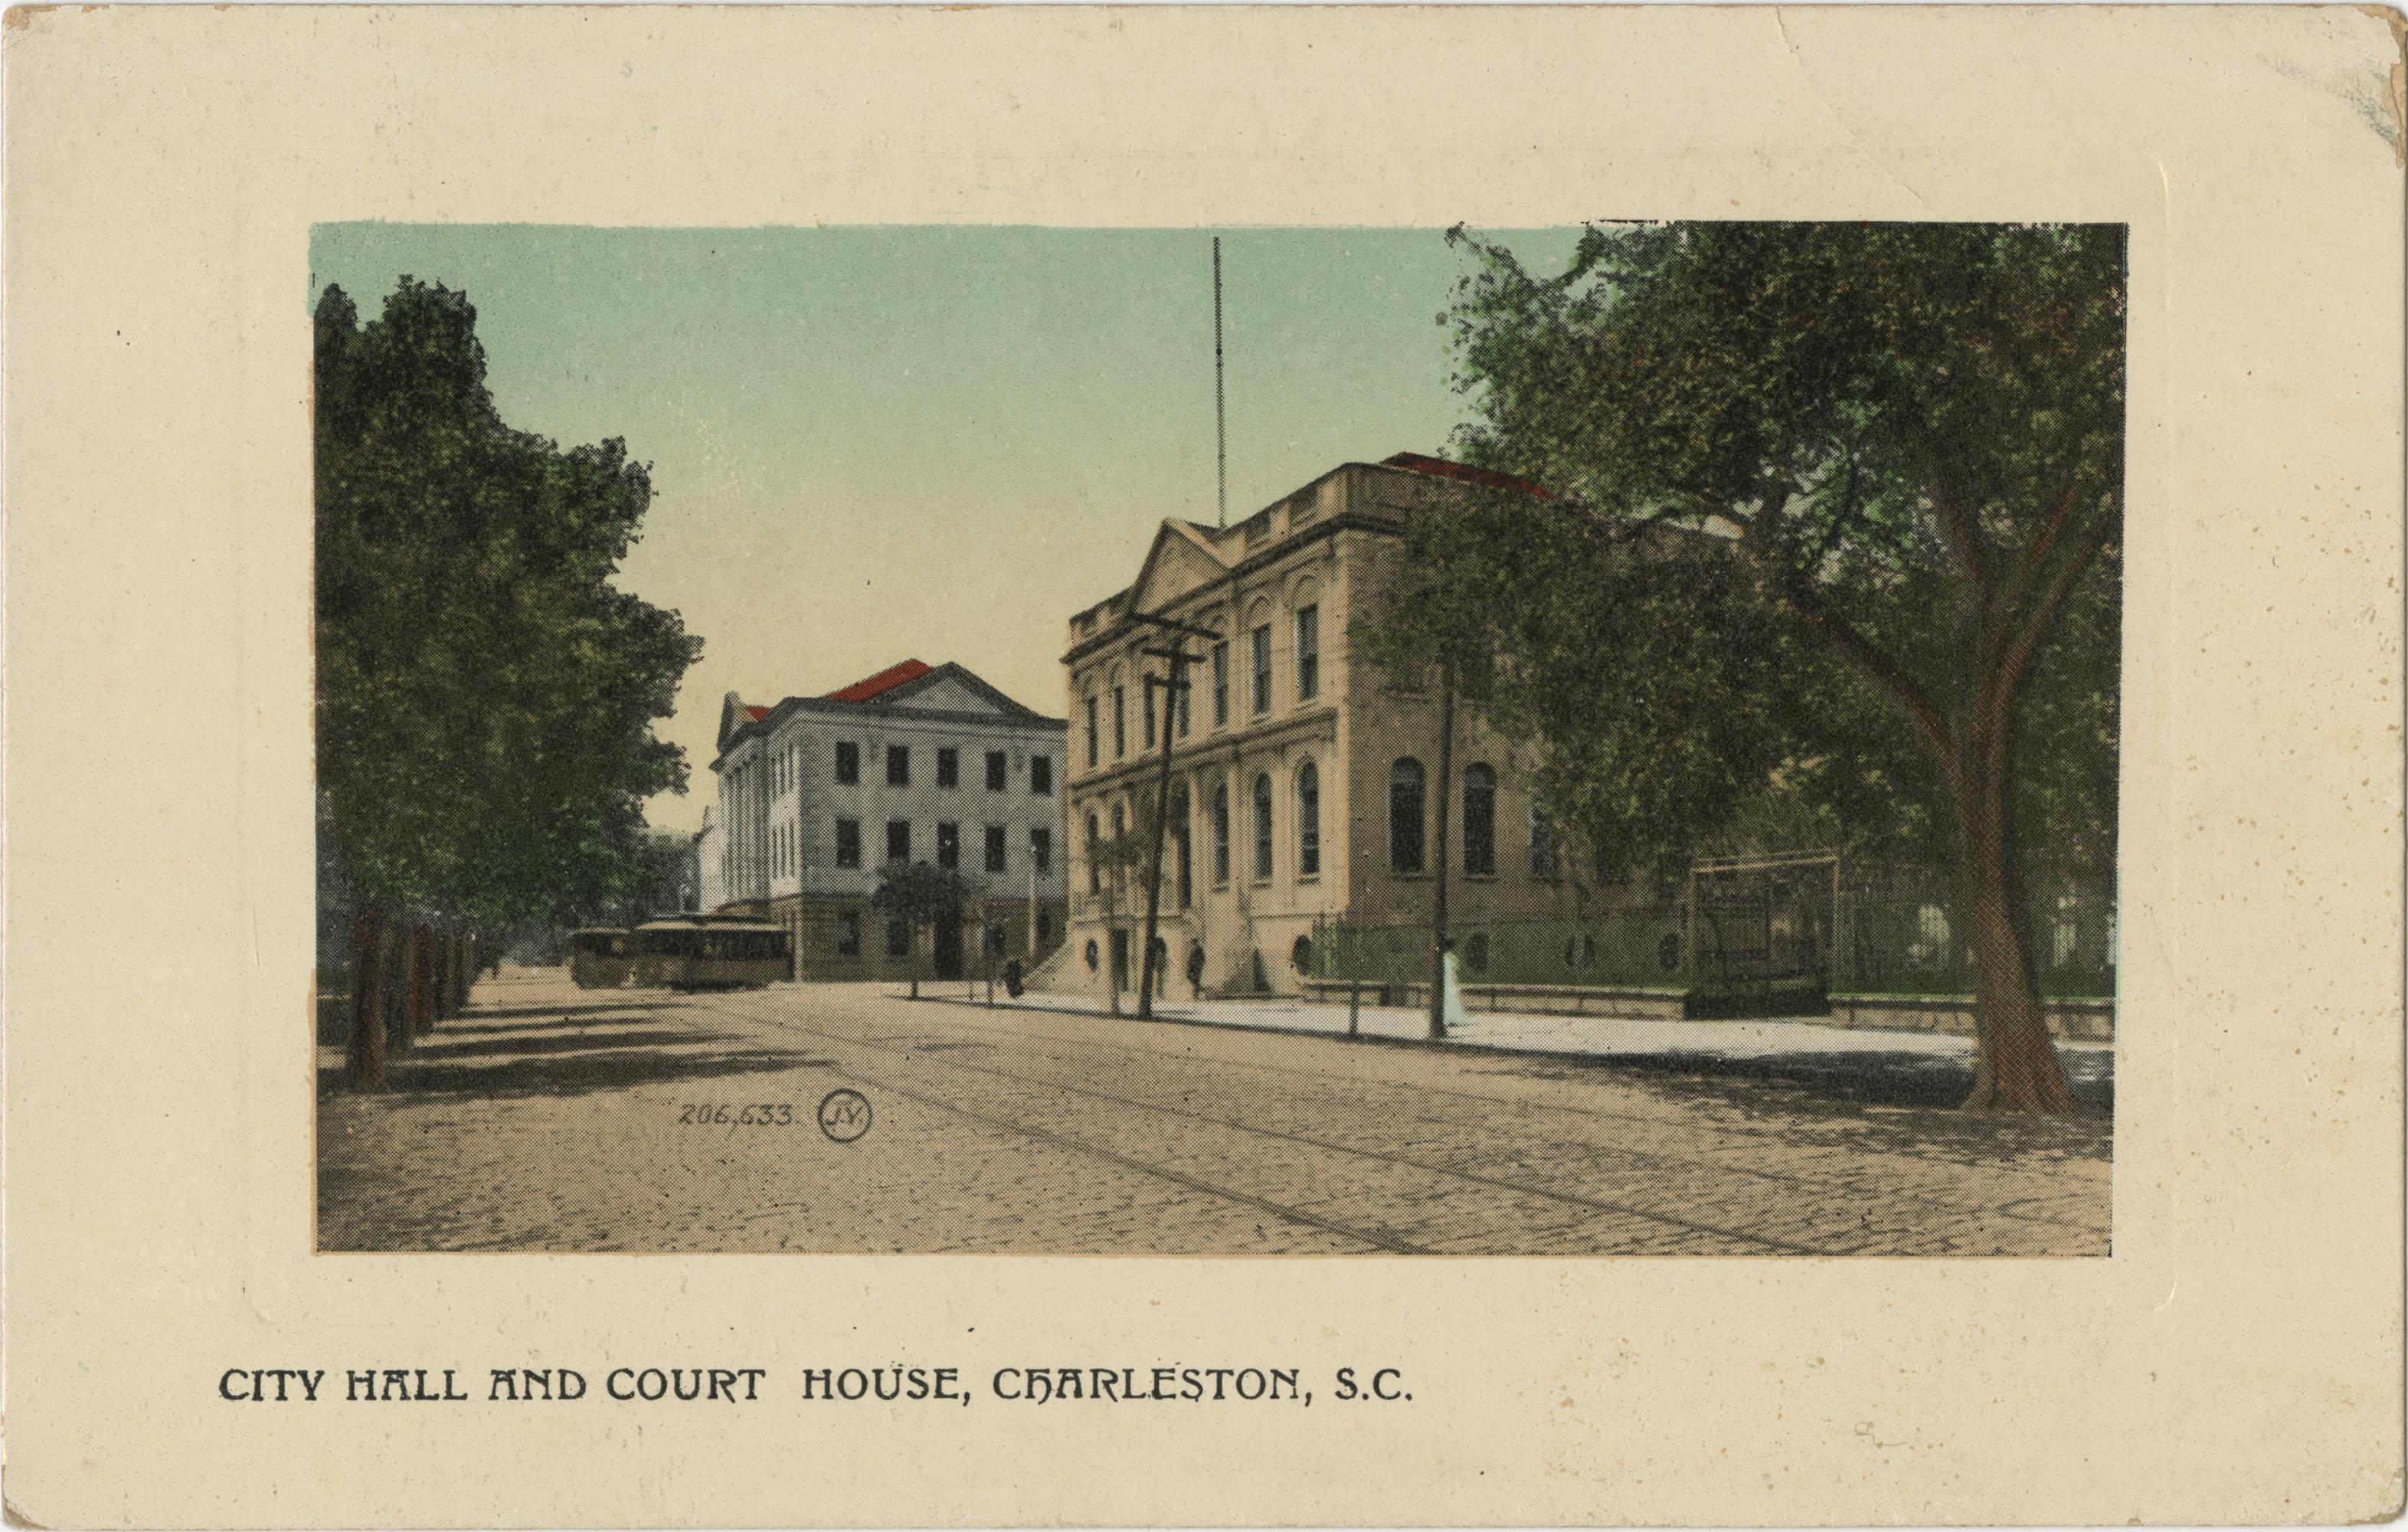 City Hall and Court House, Charleston, S.C.